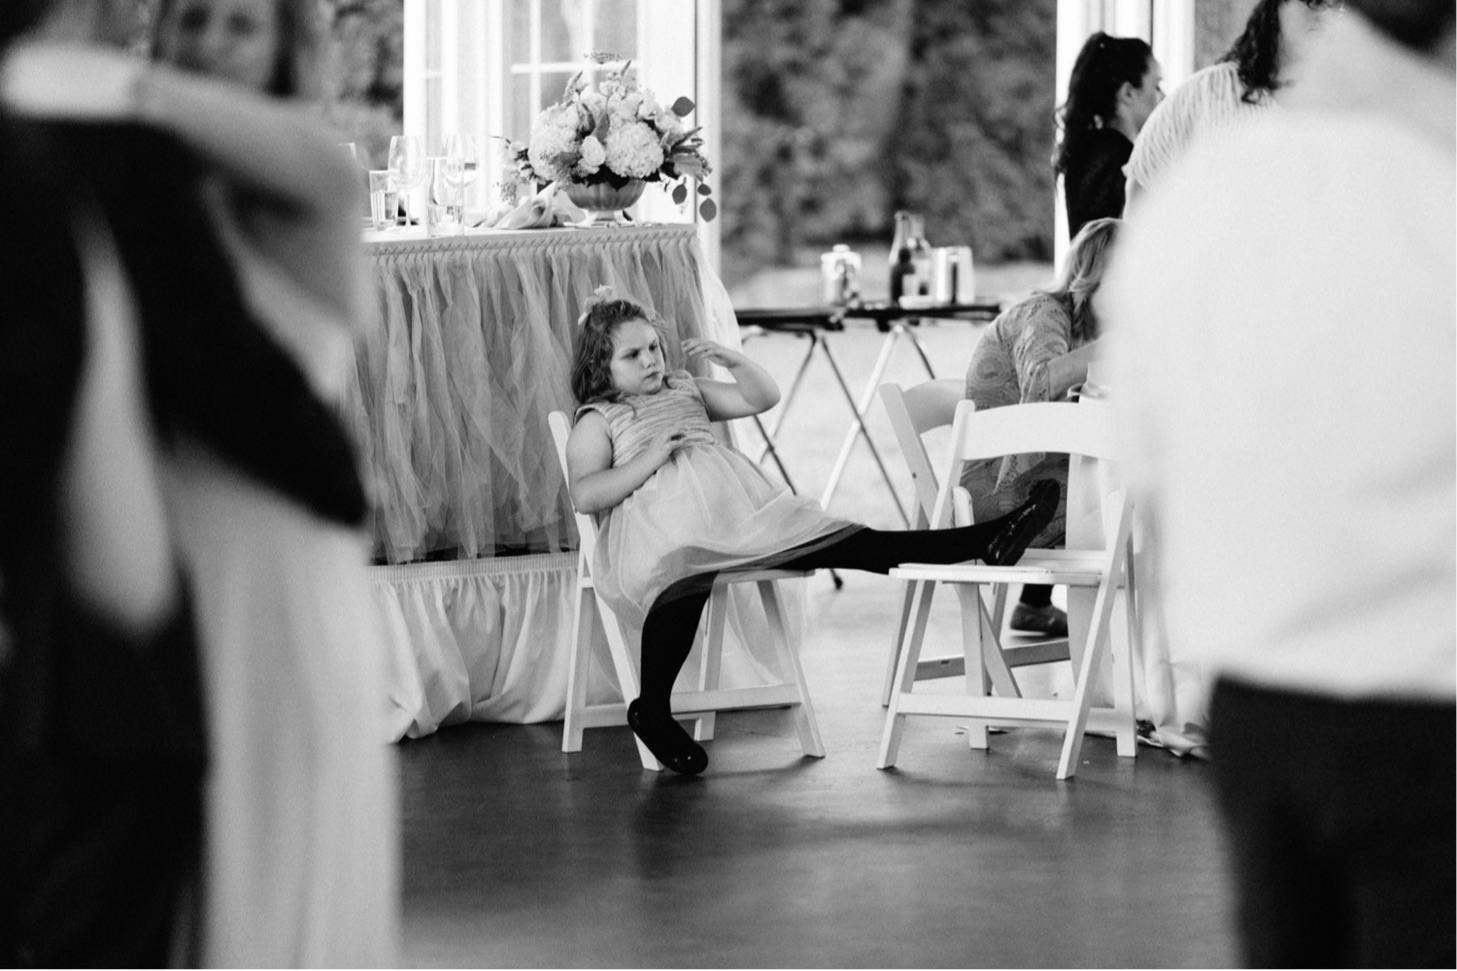 ritz-charles-wedding-reception-downtown-indianapolis-wedding-photographer055.JPG